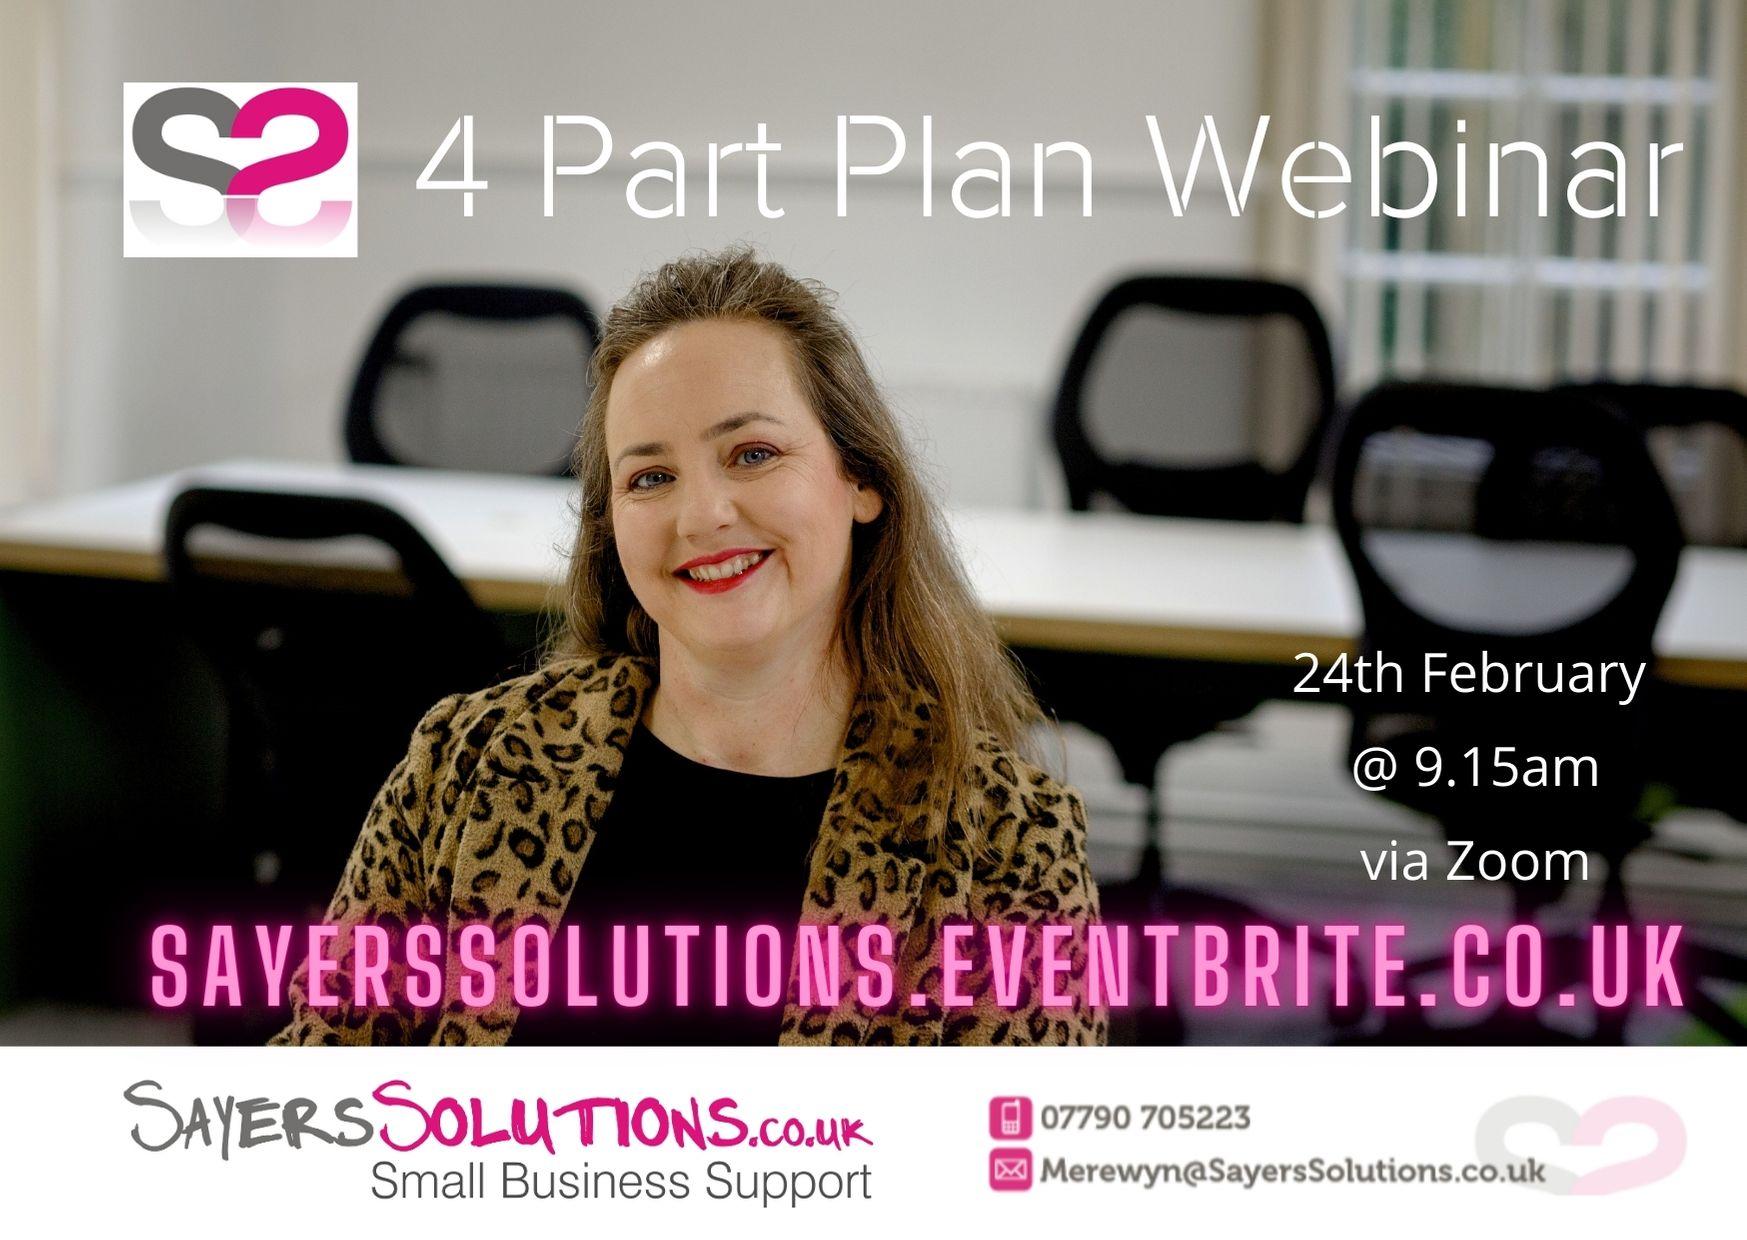 Sayers Solutions 4 Part Plan Webinar